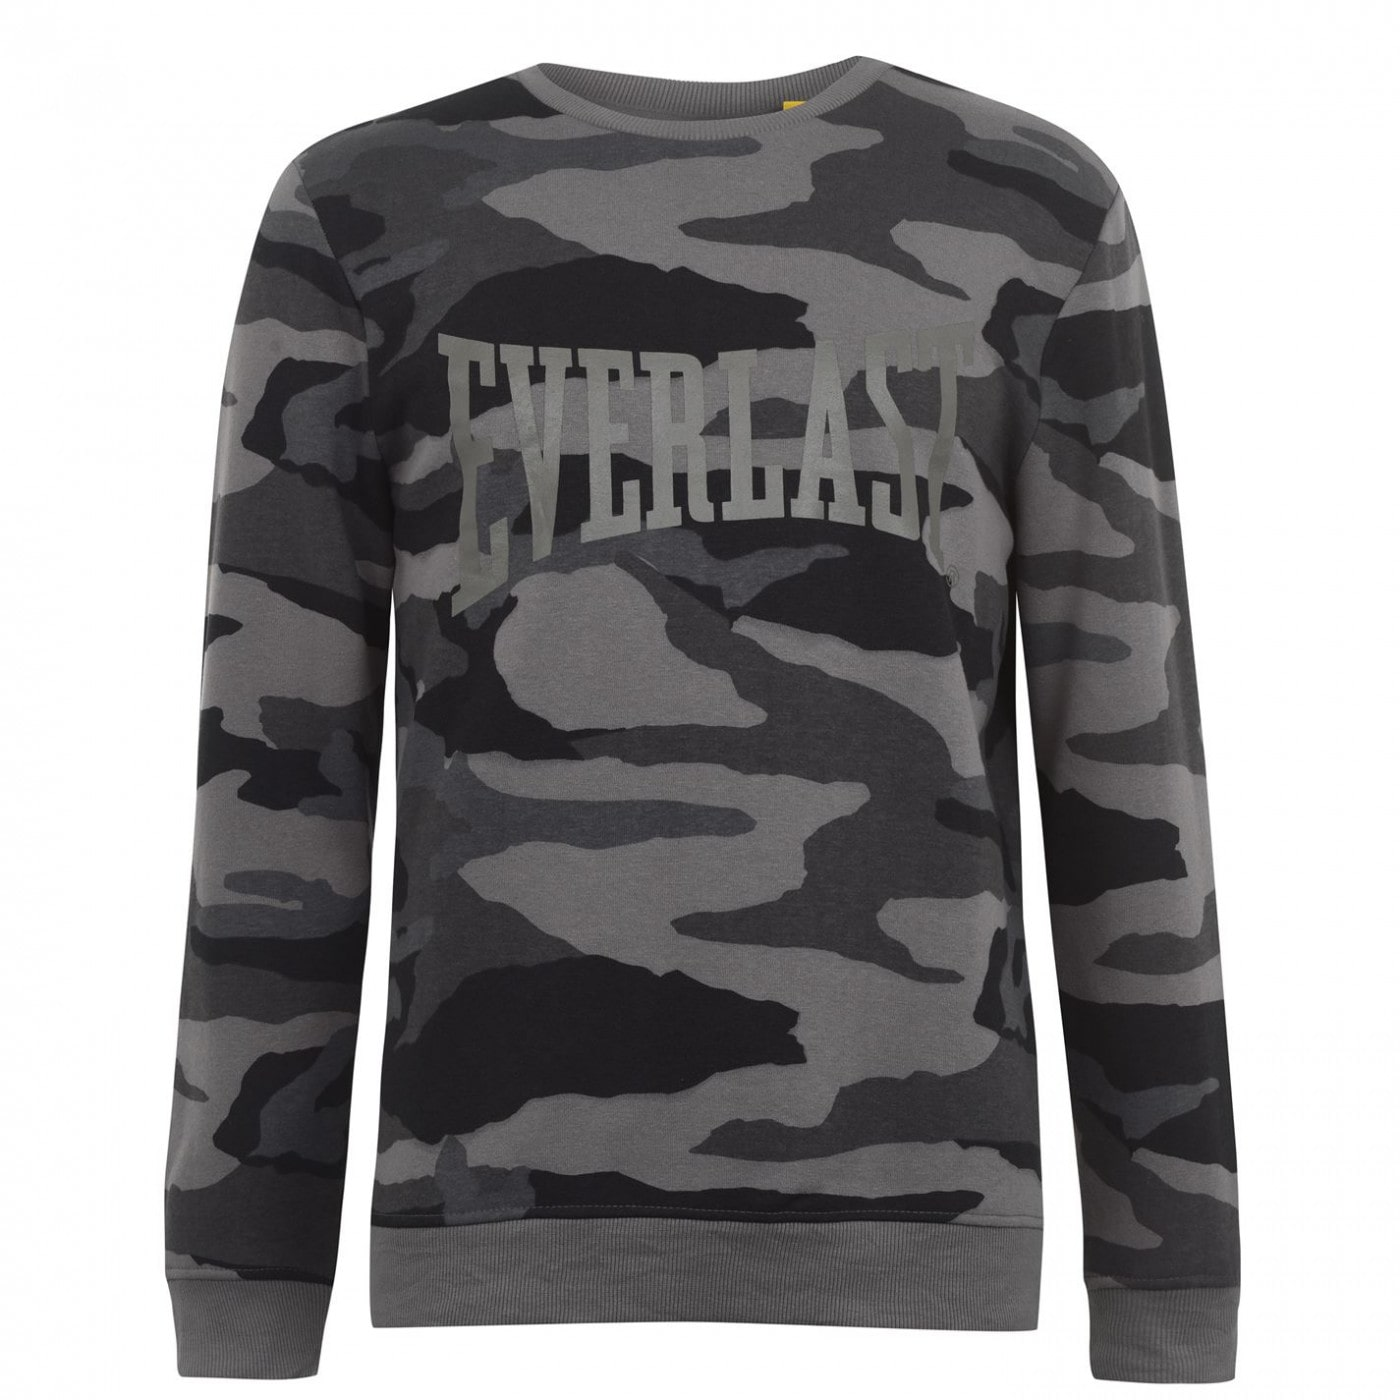 Everlast Camo Crew Sweater Mens